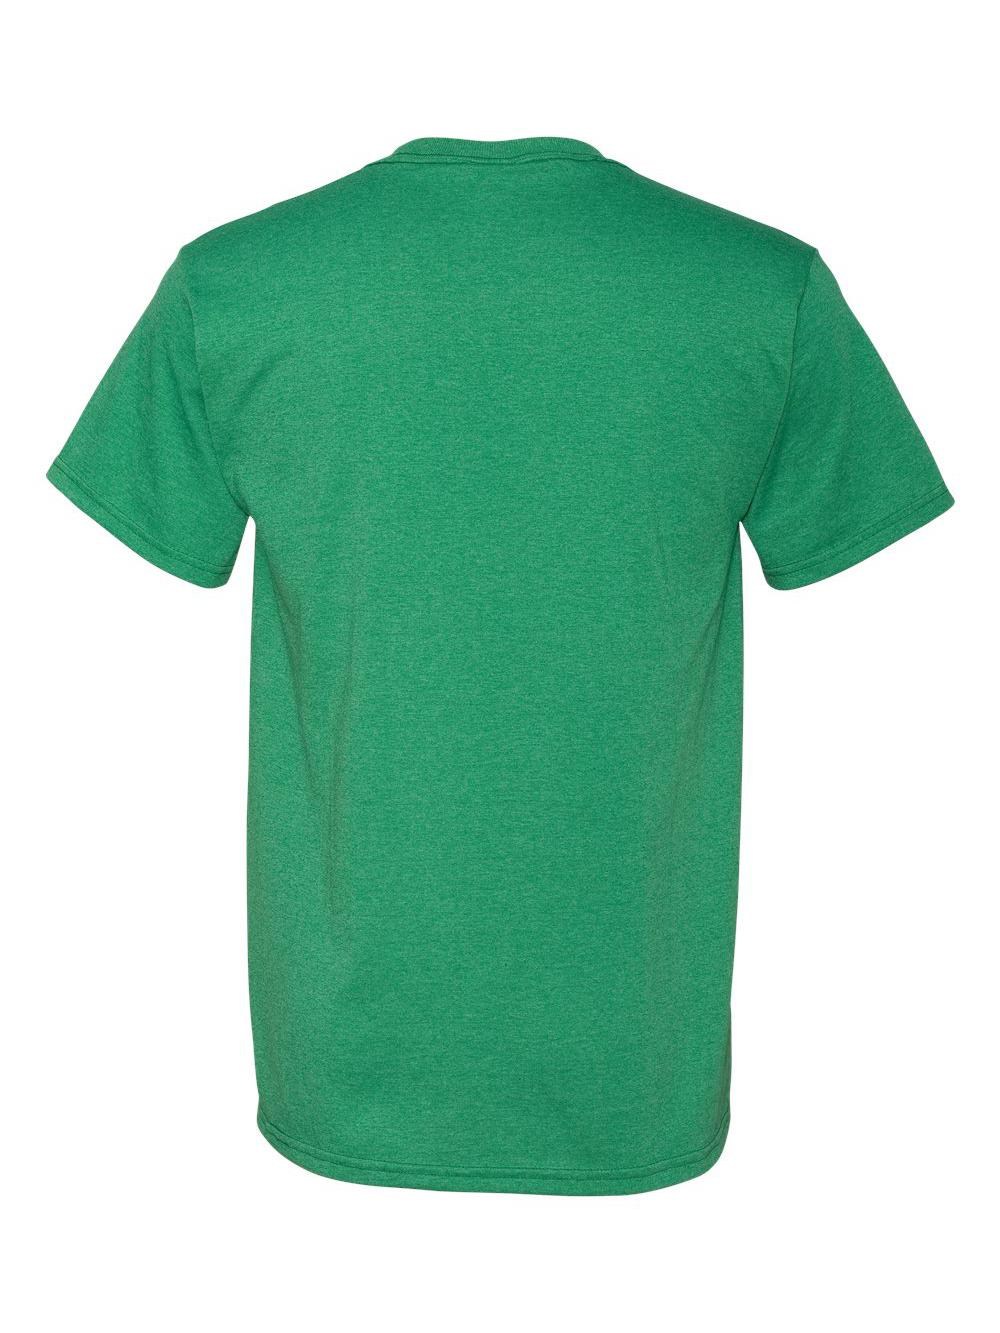 Fruit-of-the-Loom-HD-Cotton-Short-Sleeve-T-Shirt-3930R thumbnail 100